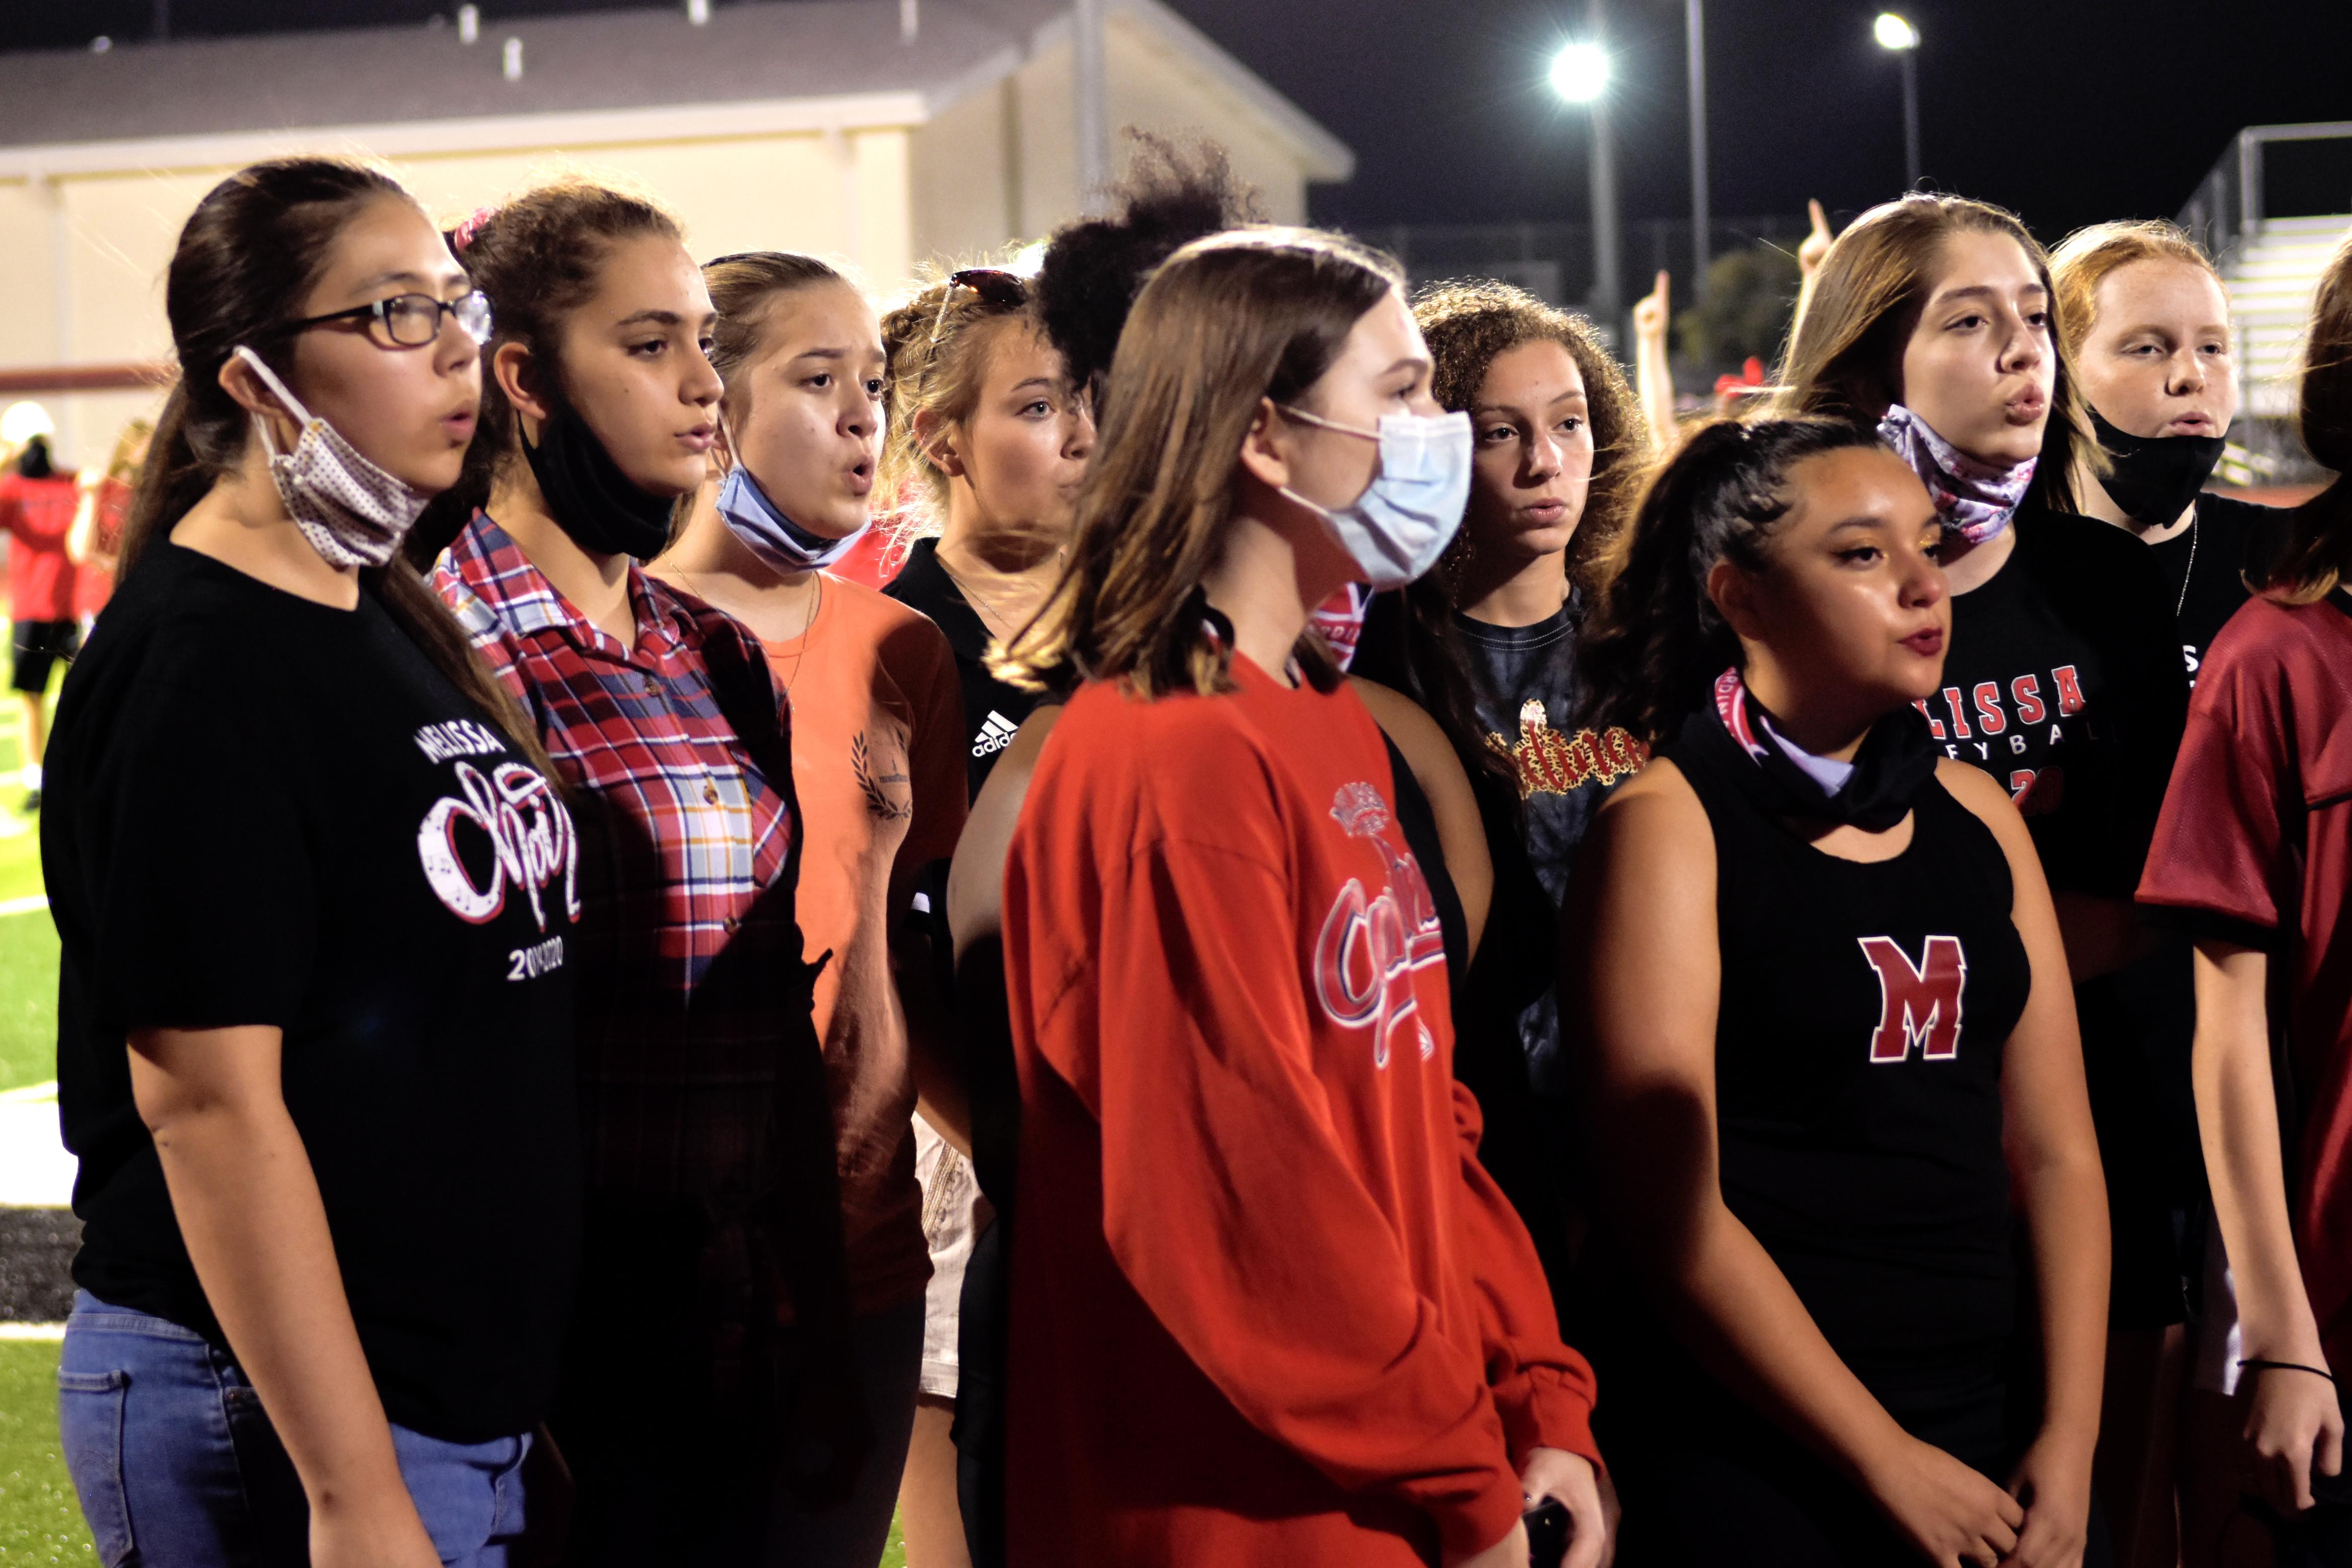 Choir students perform at Homecoming pep rally